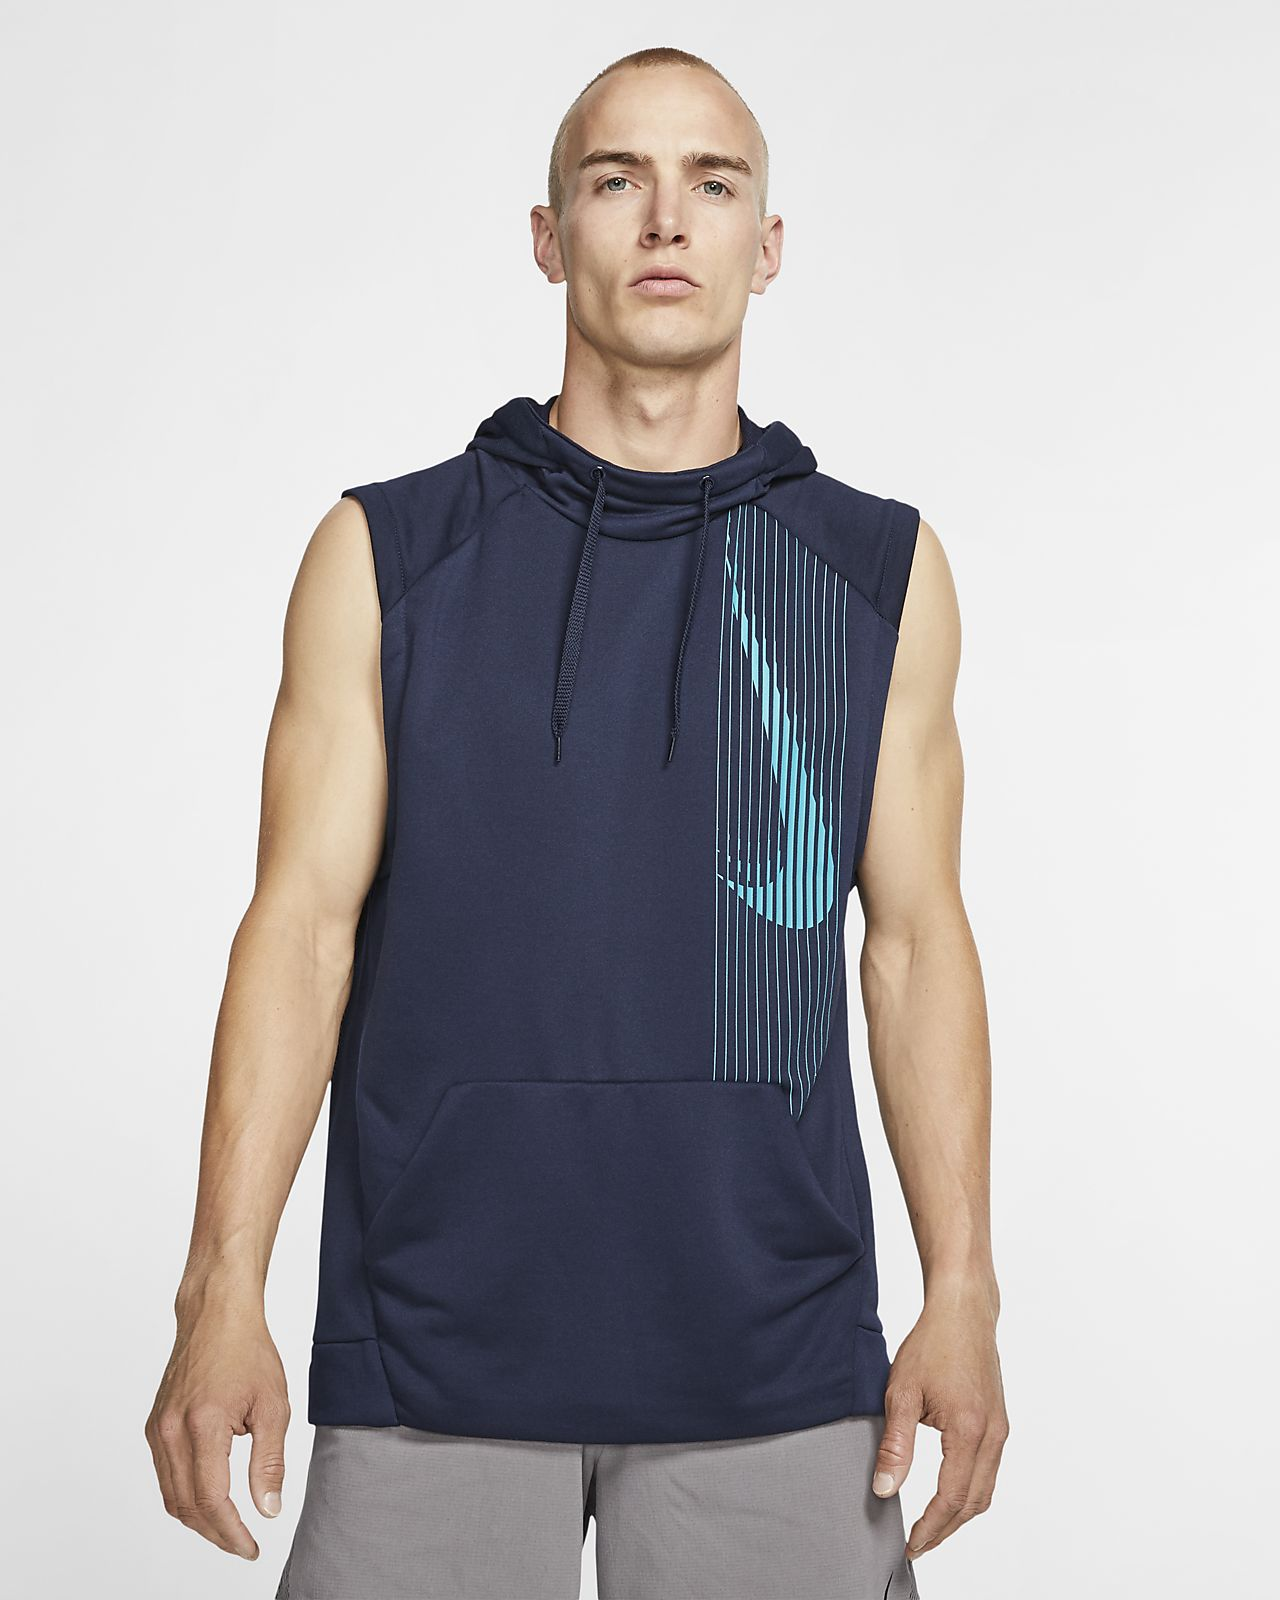 a48450a8 Nike Dri-FIT Men's Sleeveless Training Hoodie. Nike.com